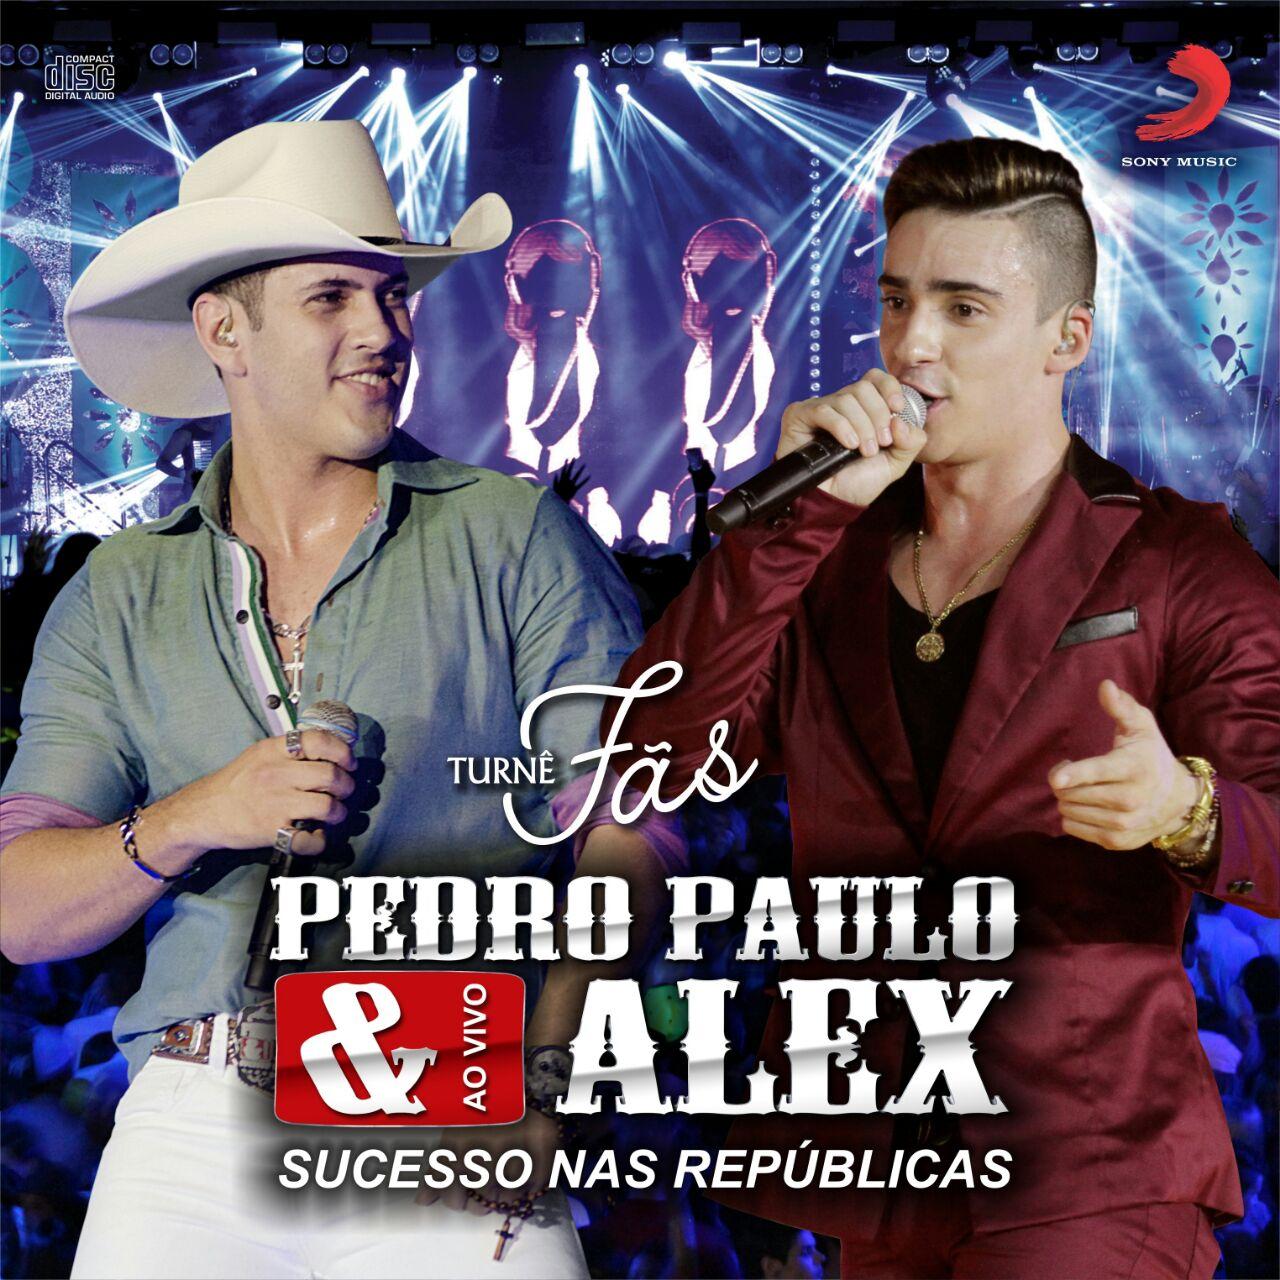 REVIEW: Pedro Paulo & Alex – Turnê Fãs